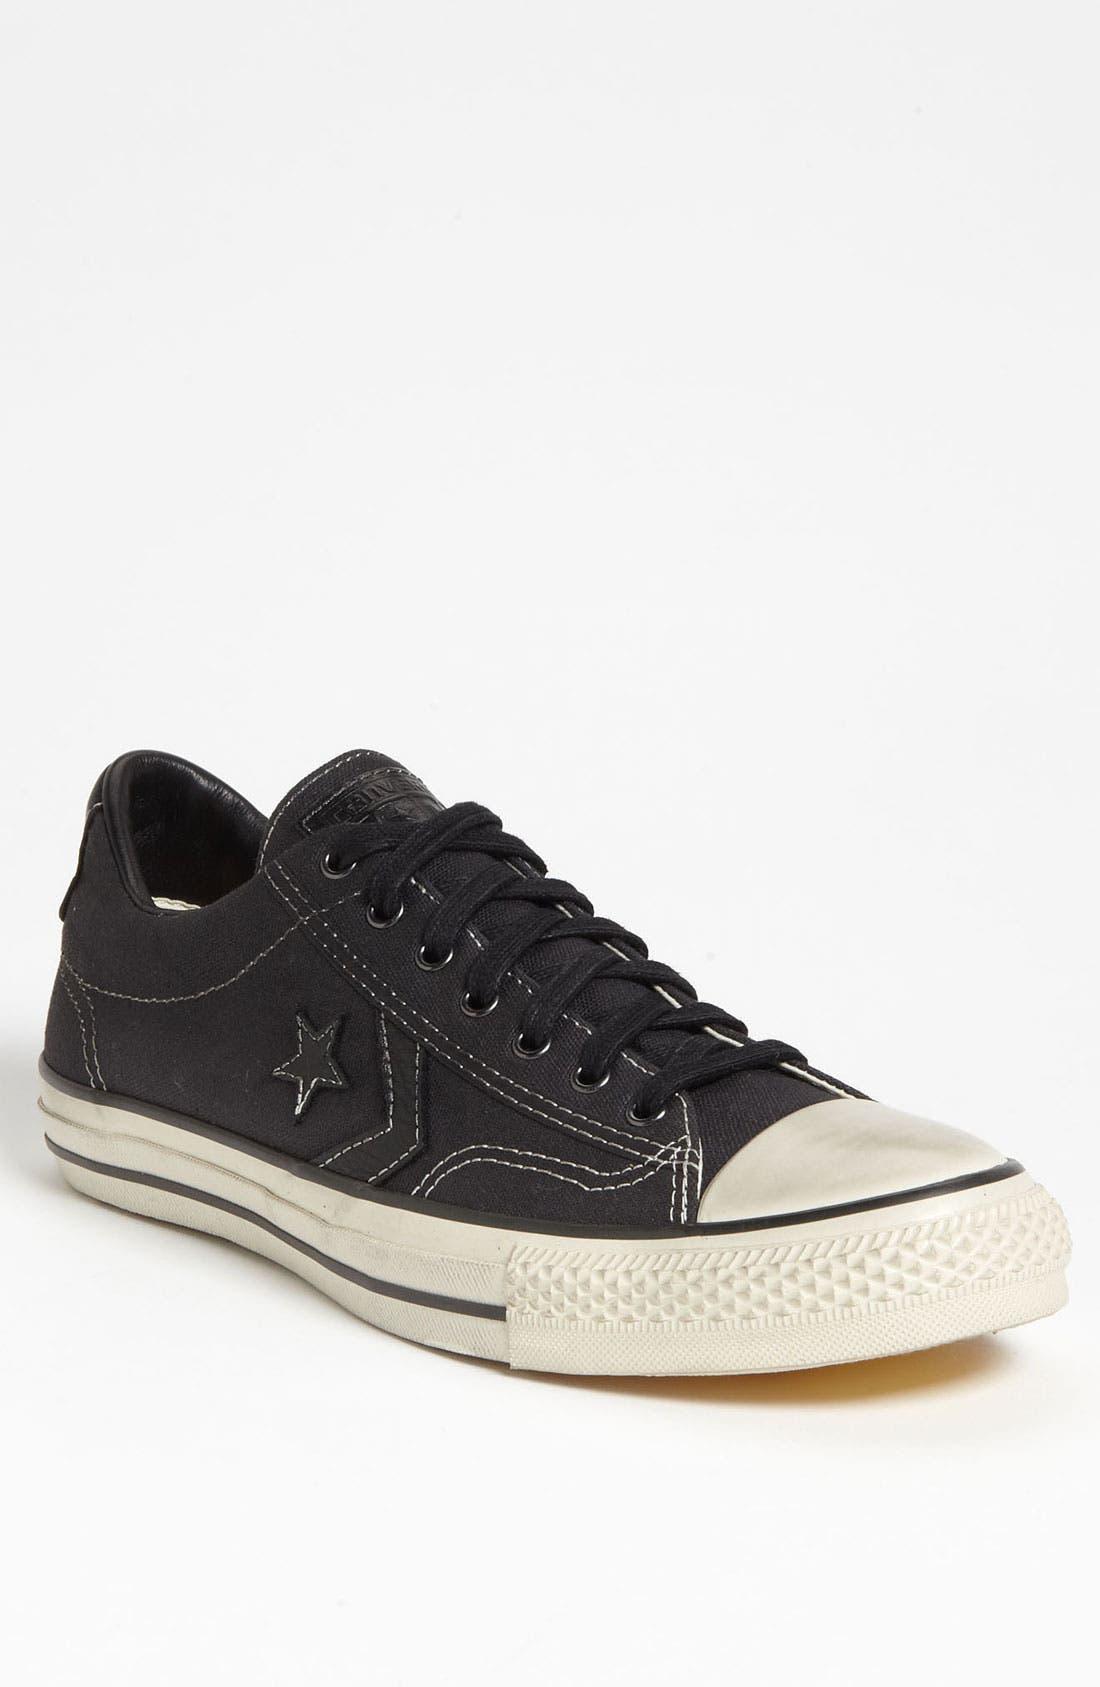 Alternate Image 1 Selected - Converse by John Varvatos 'Star Player EV' Sneaker (Men)